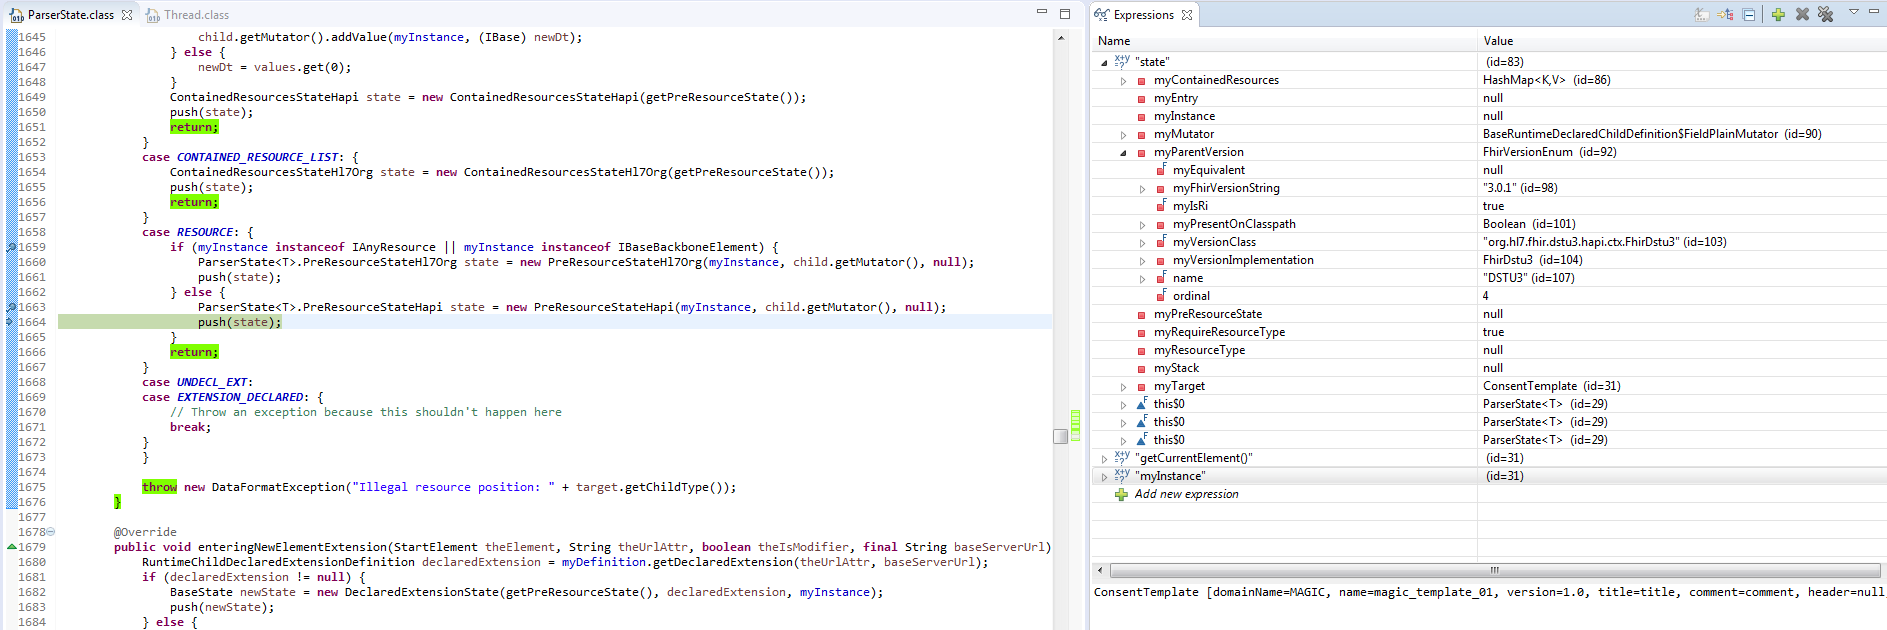 screenshot_debugging_consent_template